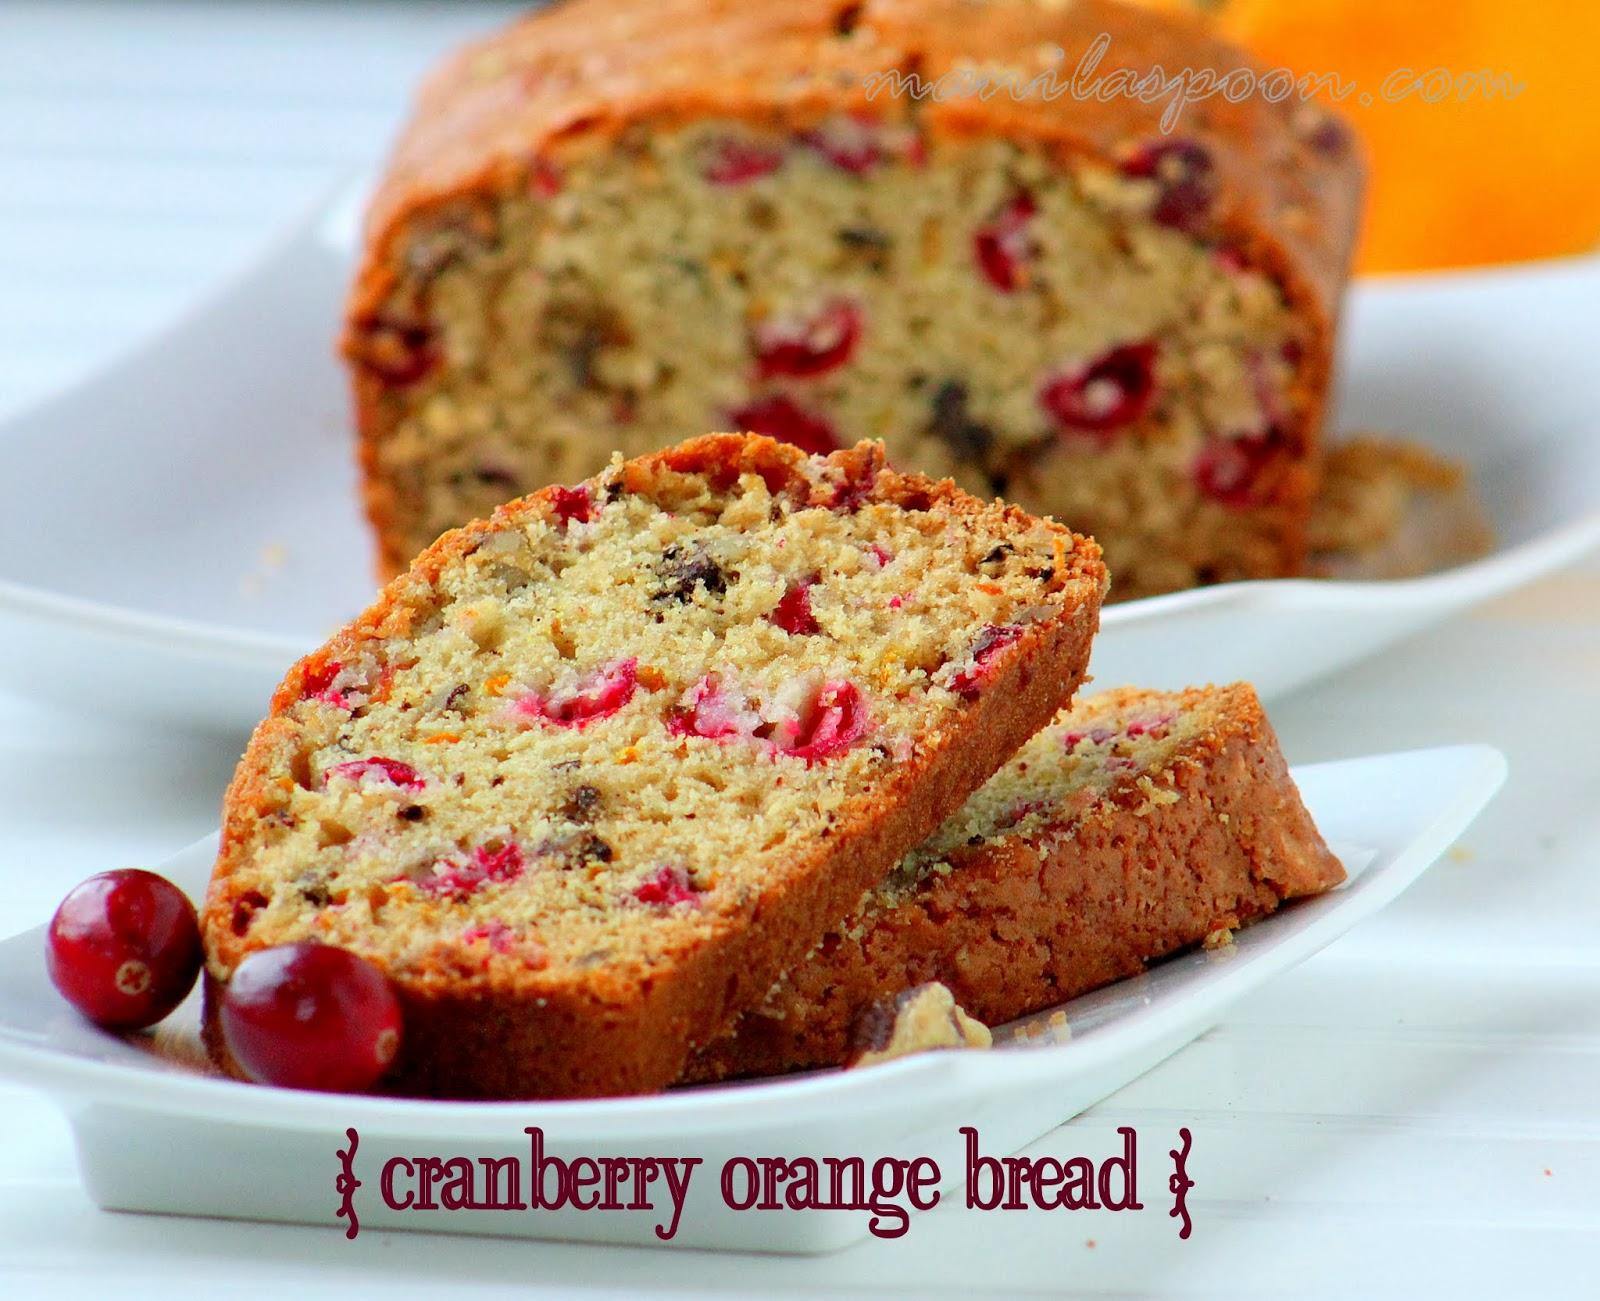 Cranberry Orange Bread with Lemon Glaze